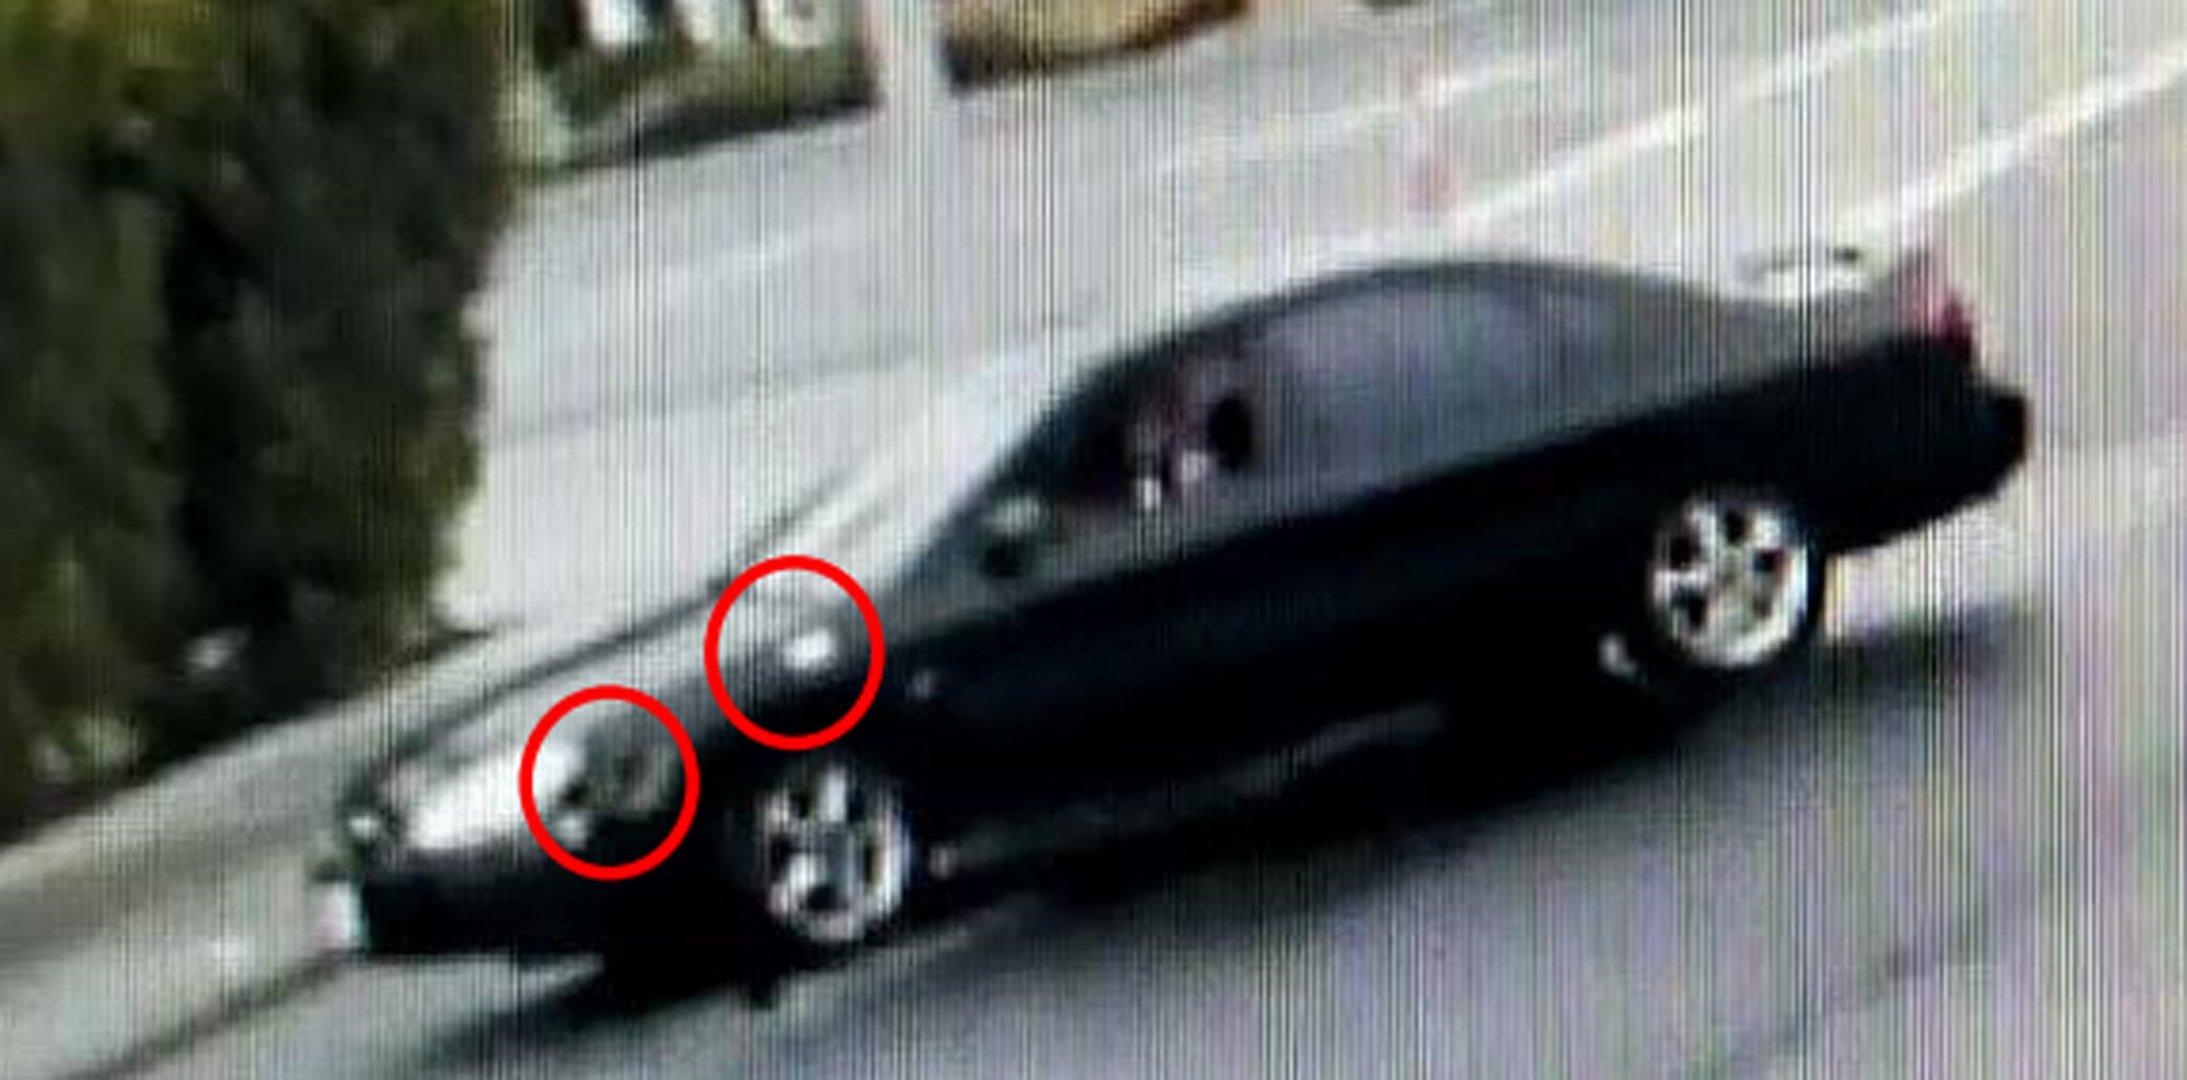 Alleged suspect vehicle seen in the photo on Jan. 6, 2020. (Credit: Hemet Police Department)